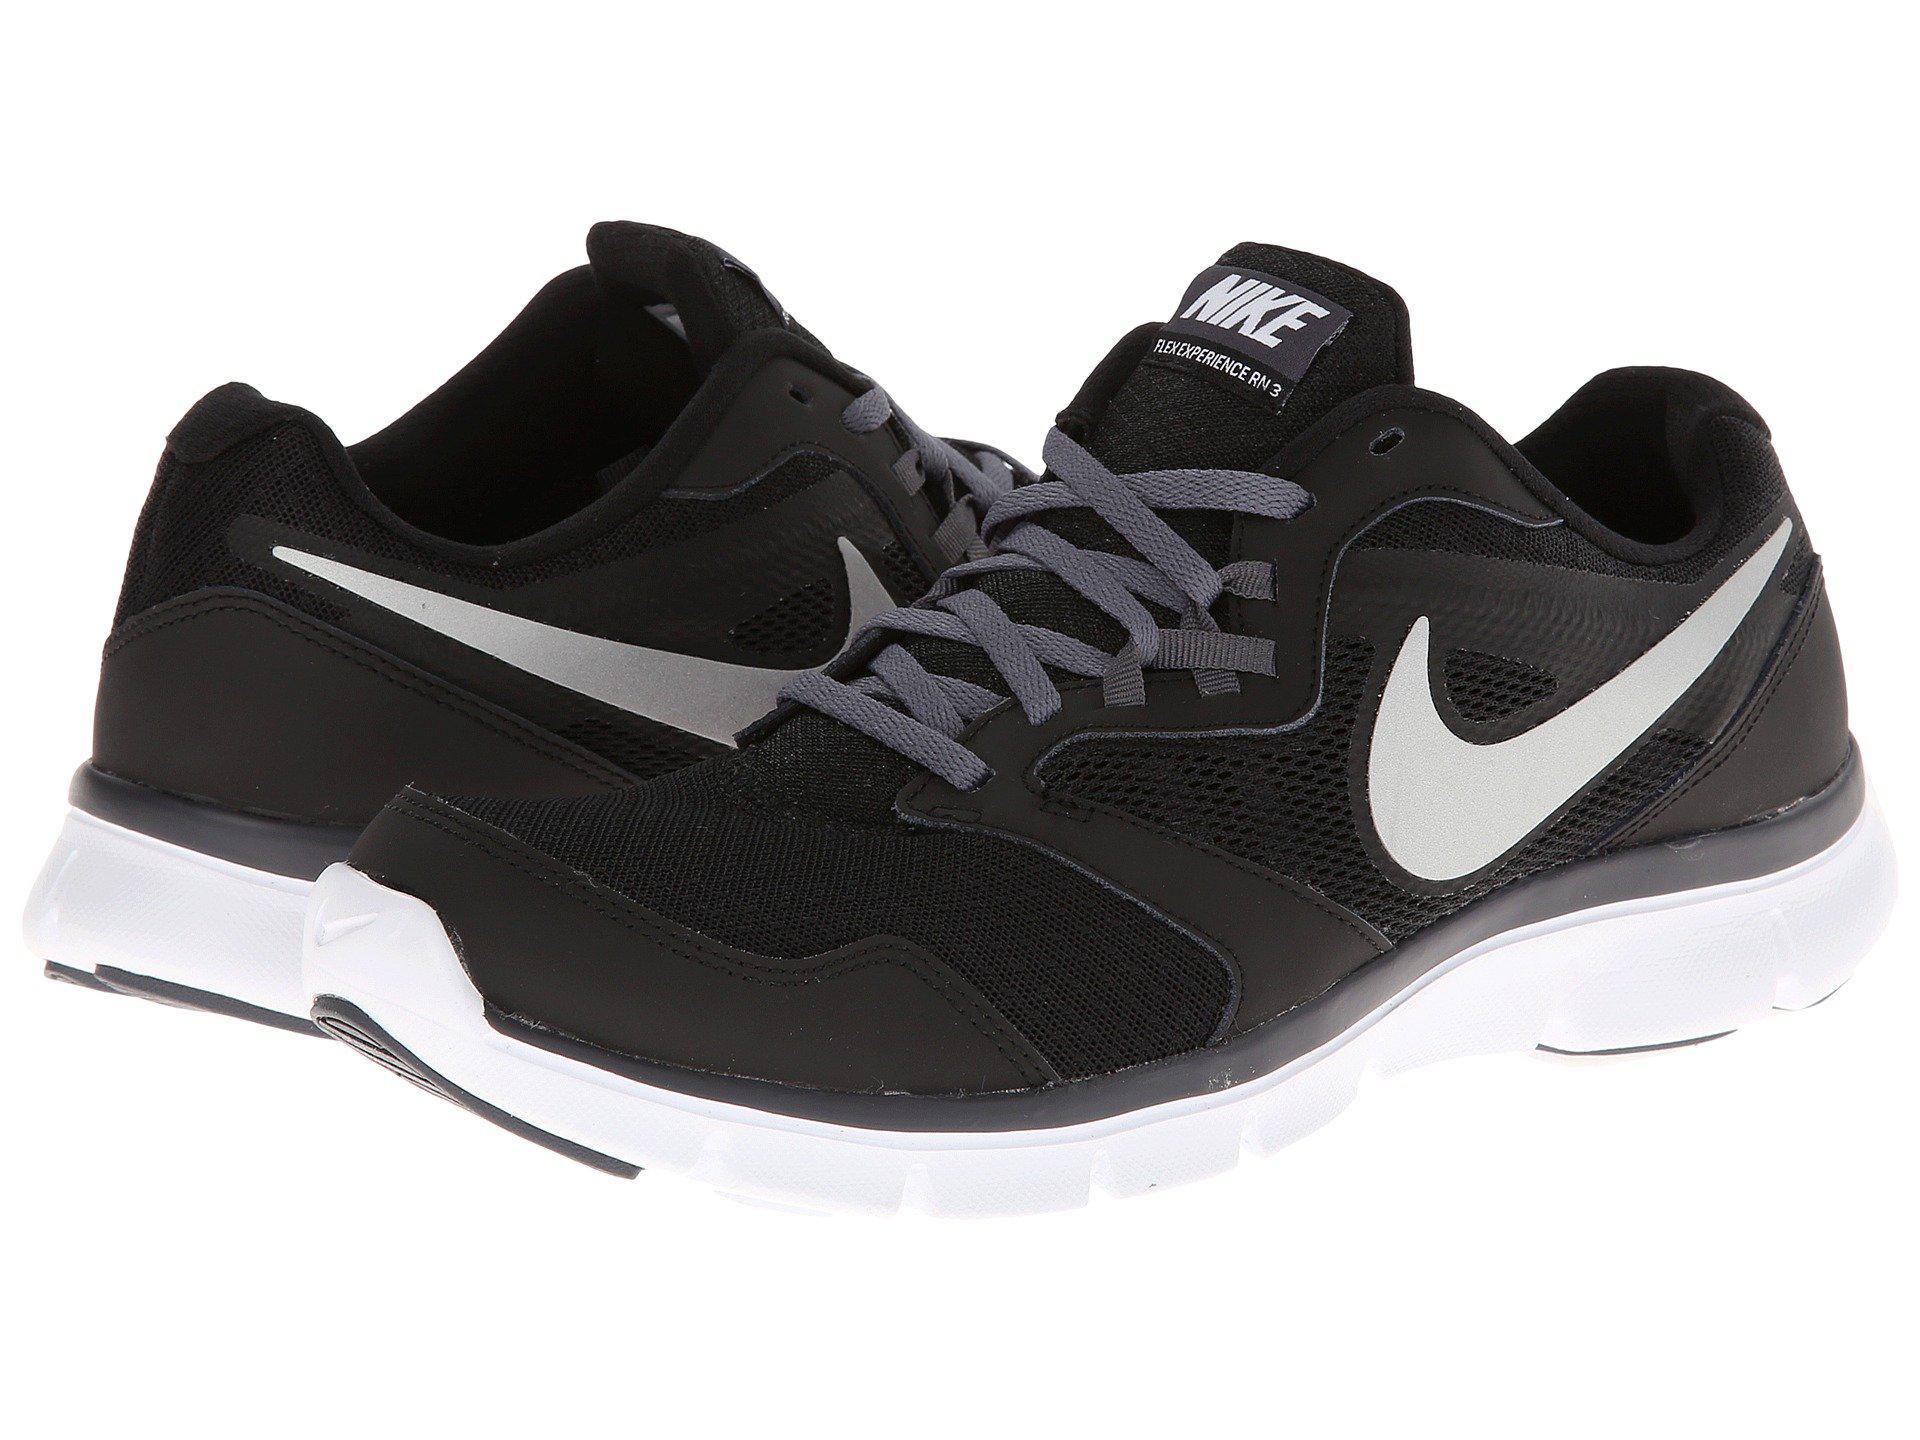 9ad660dafb93 Lyst - Nike Flex Experience Run 3 in Black for Men